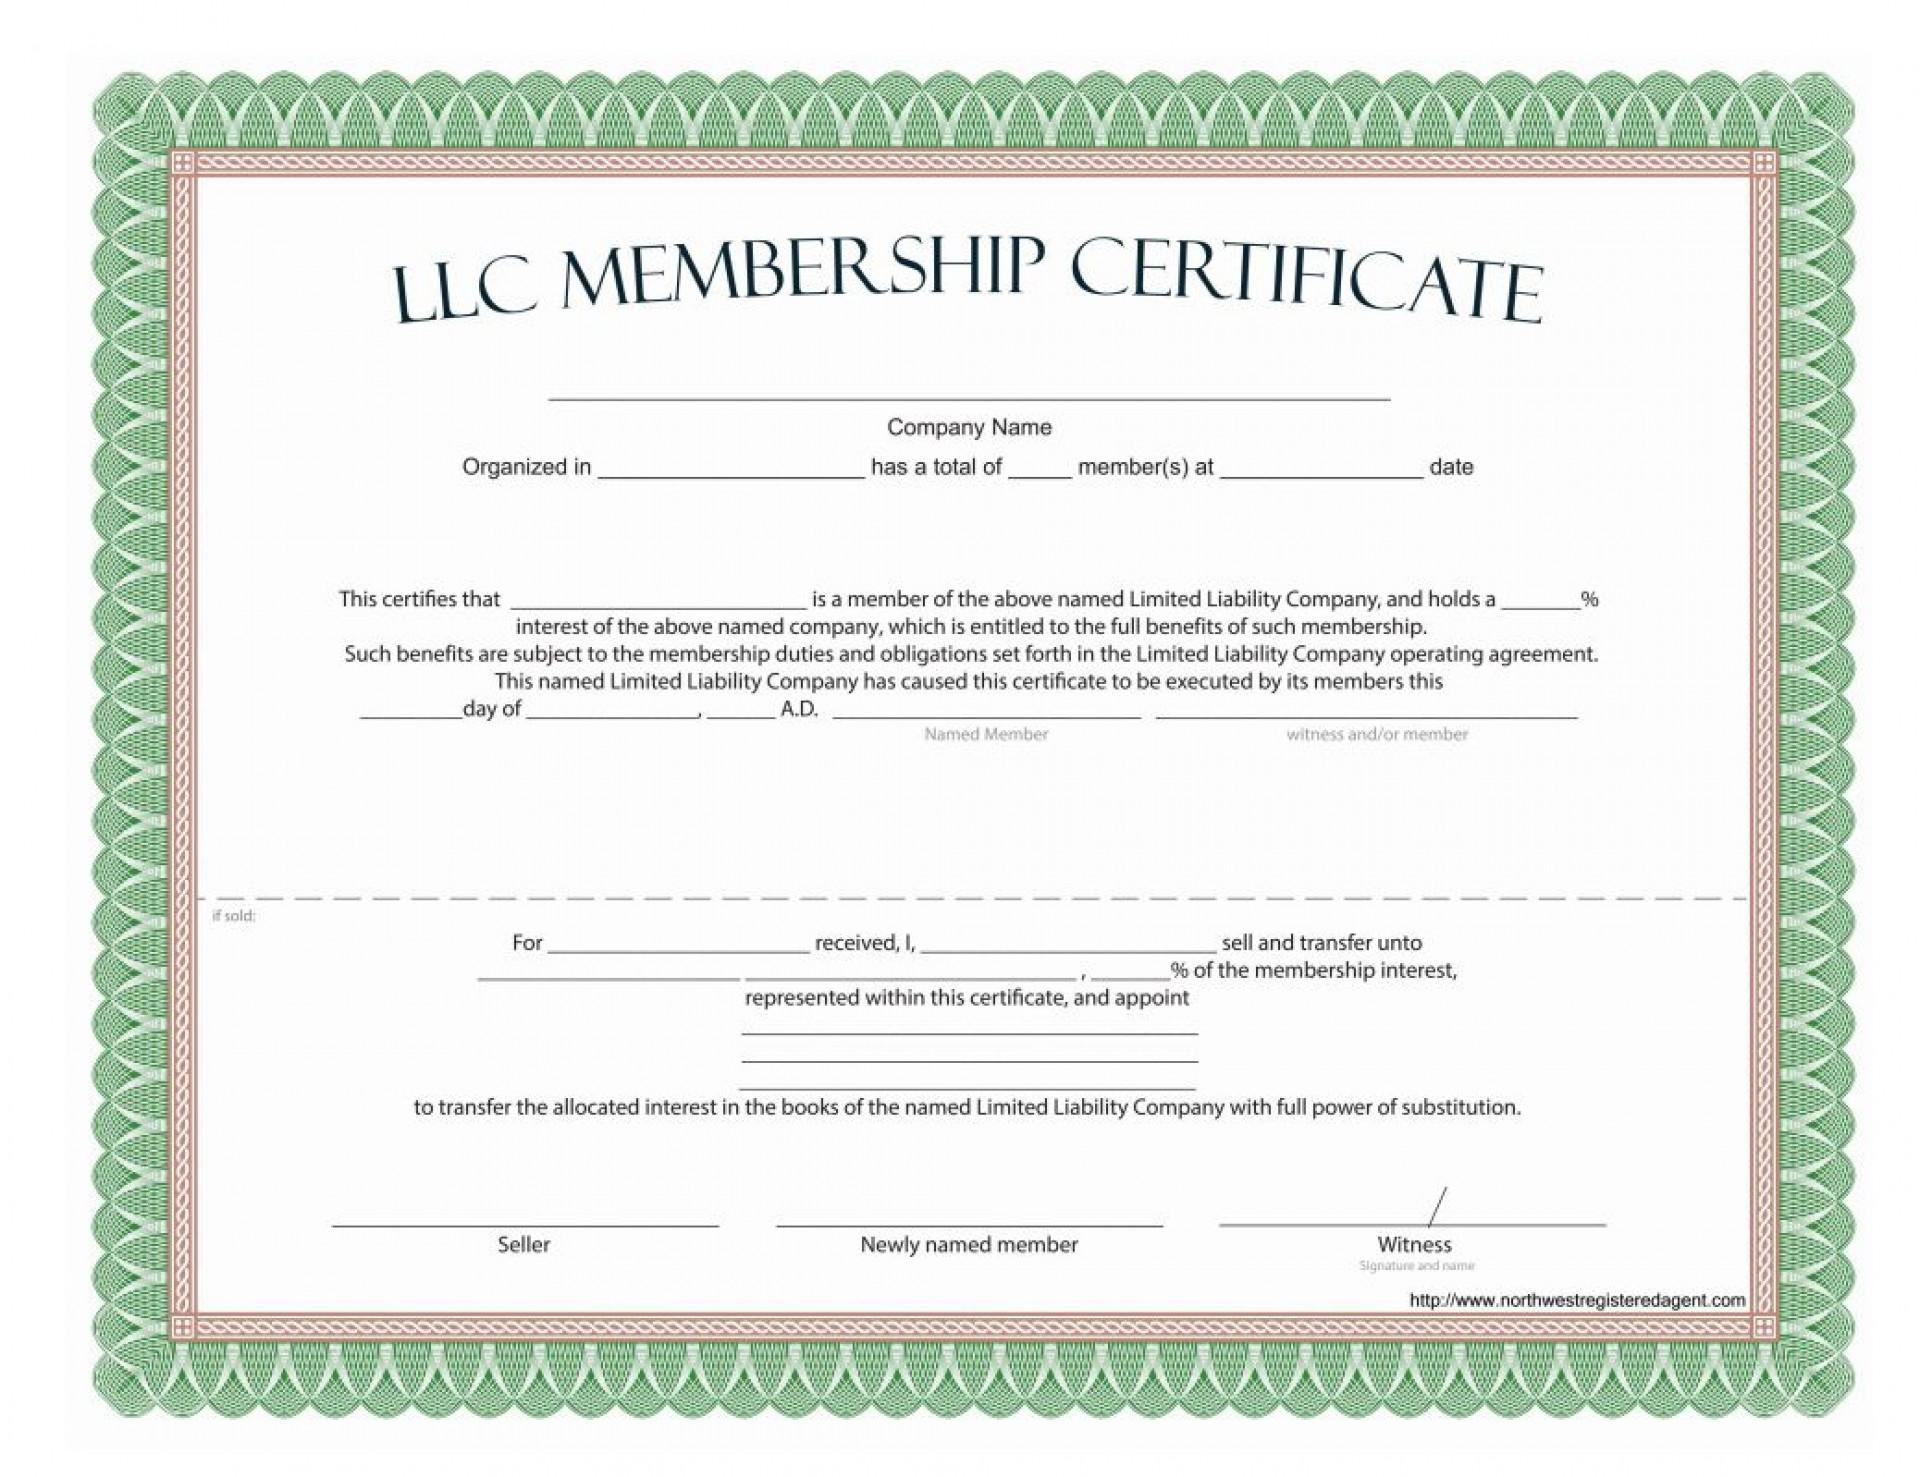 009 Dreaded Llc Membership Certificate Template Highest Clarity  Interest Free Member1920